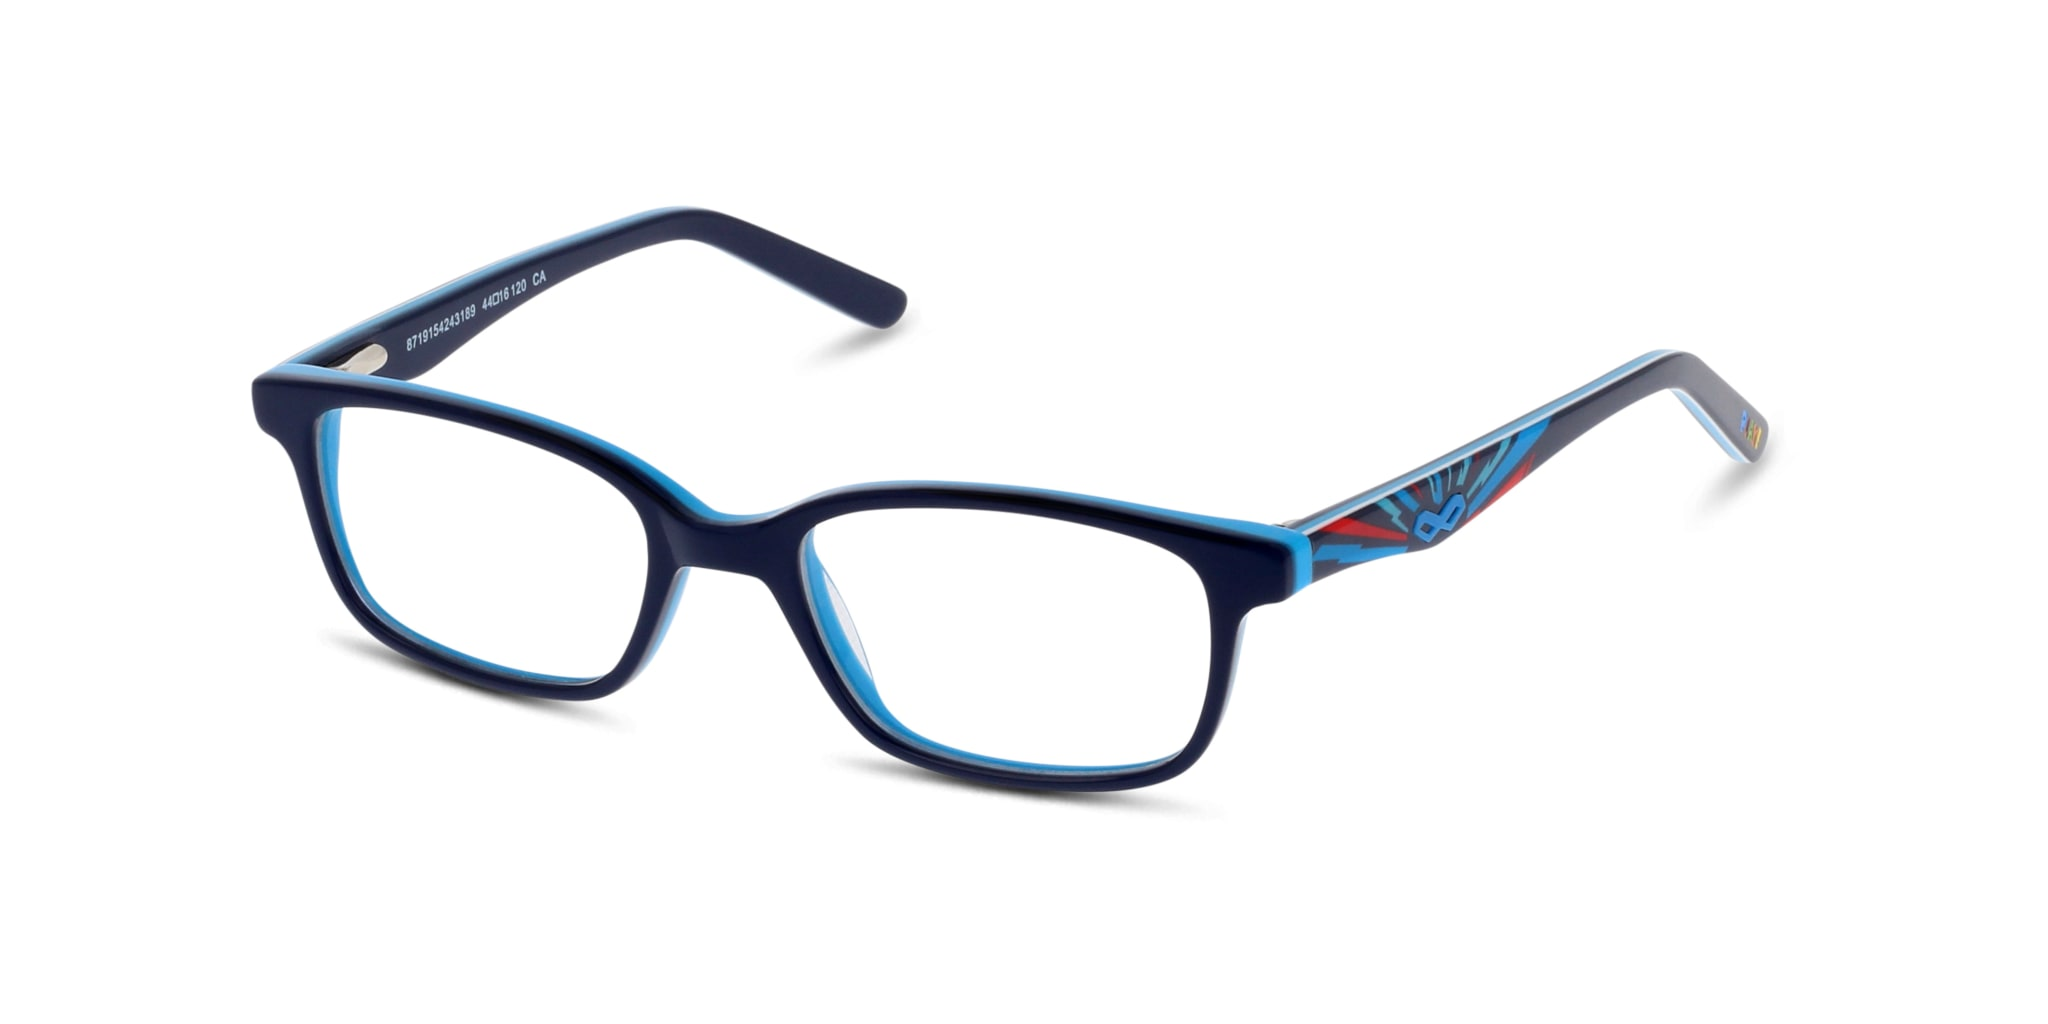 8719154243189-angle-01-play-plfk06-eyewear-navy-blue-blue